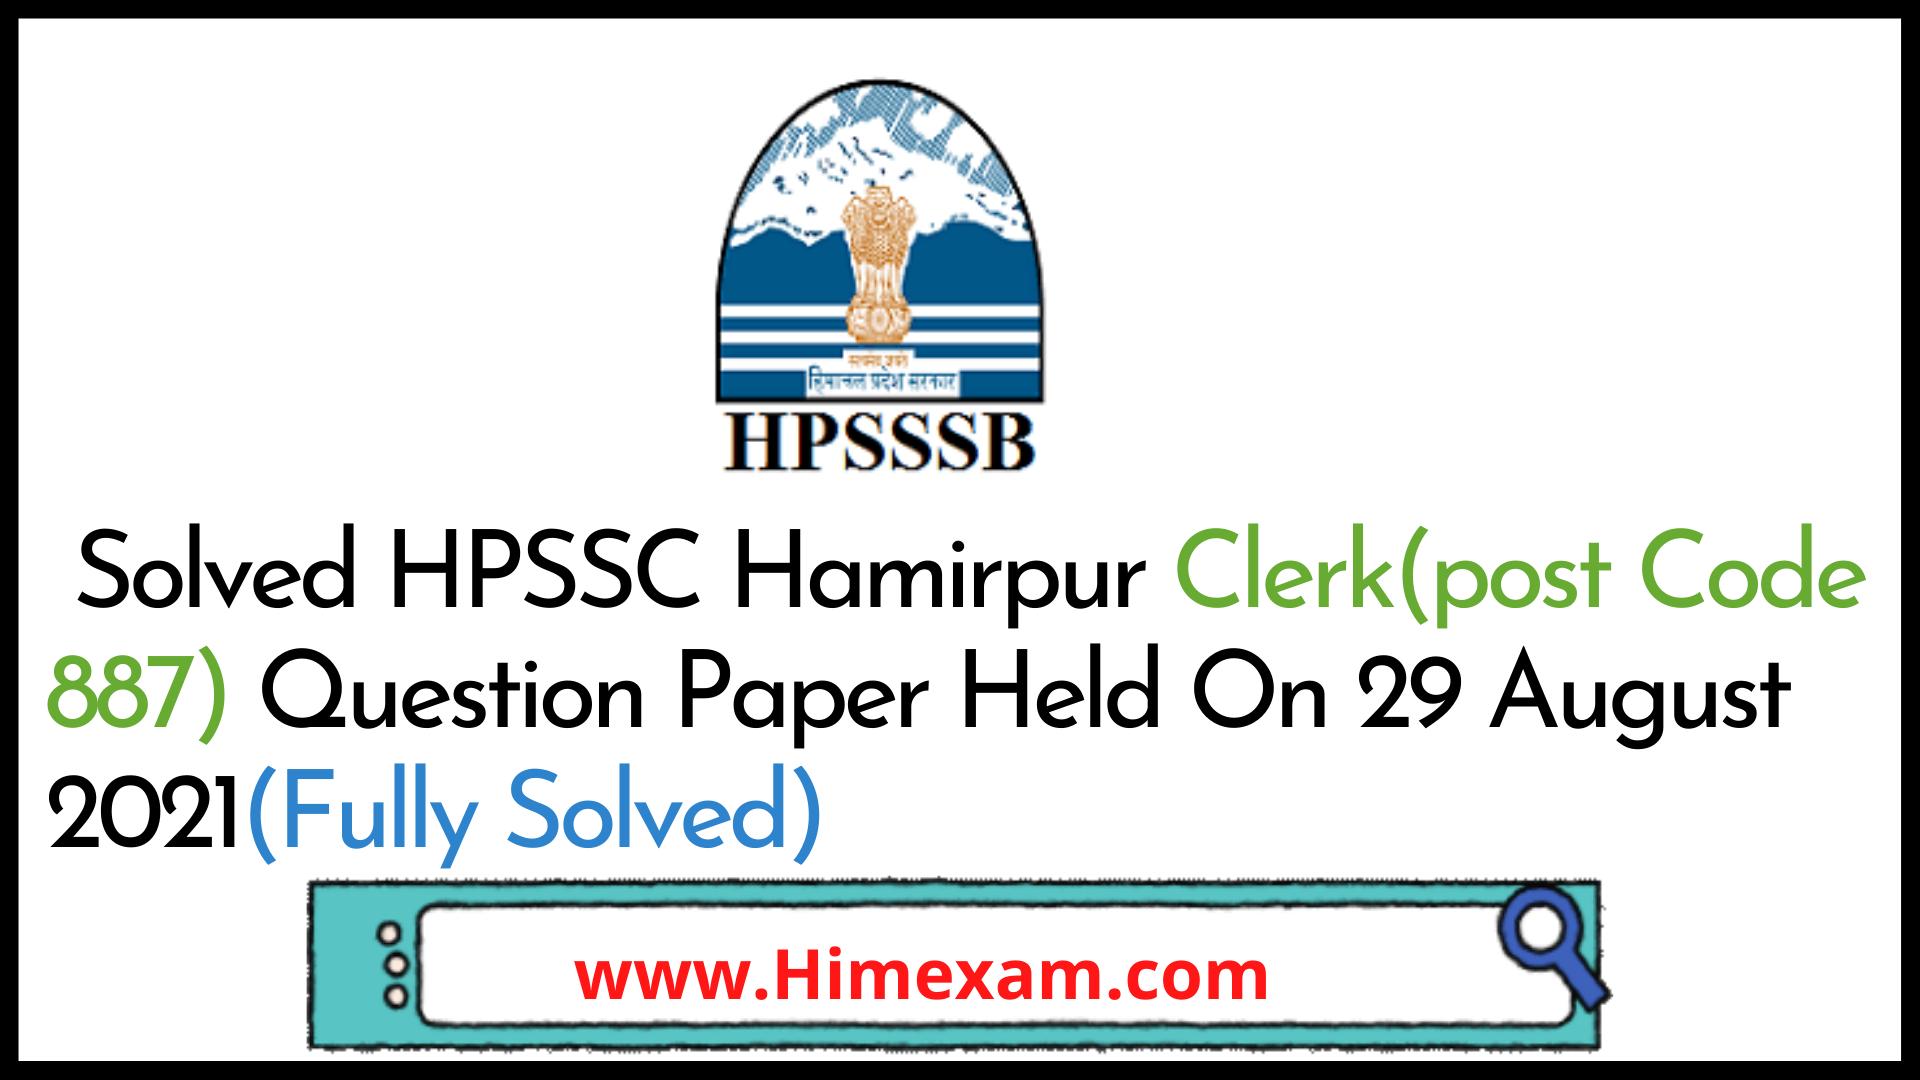 Solved HPSSC Hamirpur Clerk(post Code 887) Question Paper Held On 29 August 2021(Fully Solved)